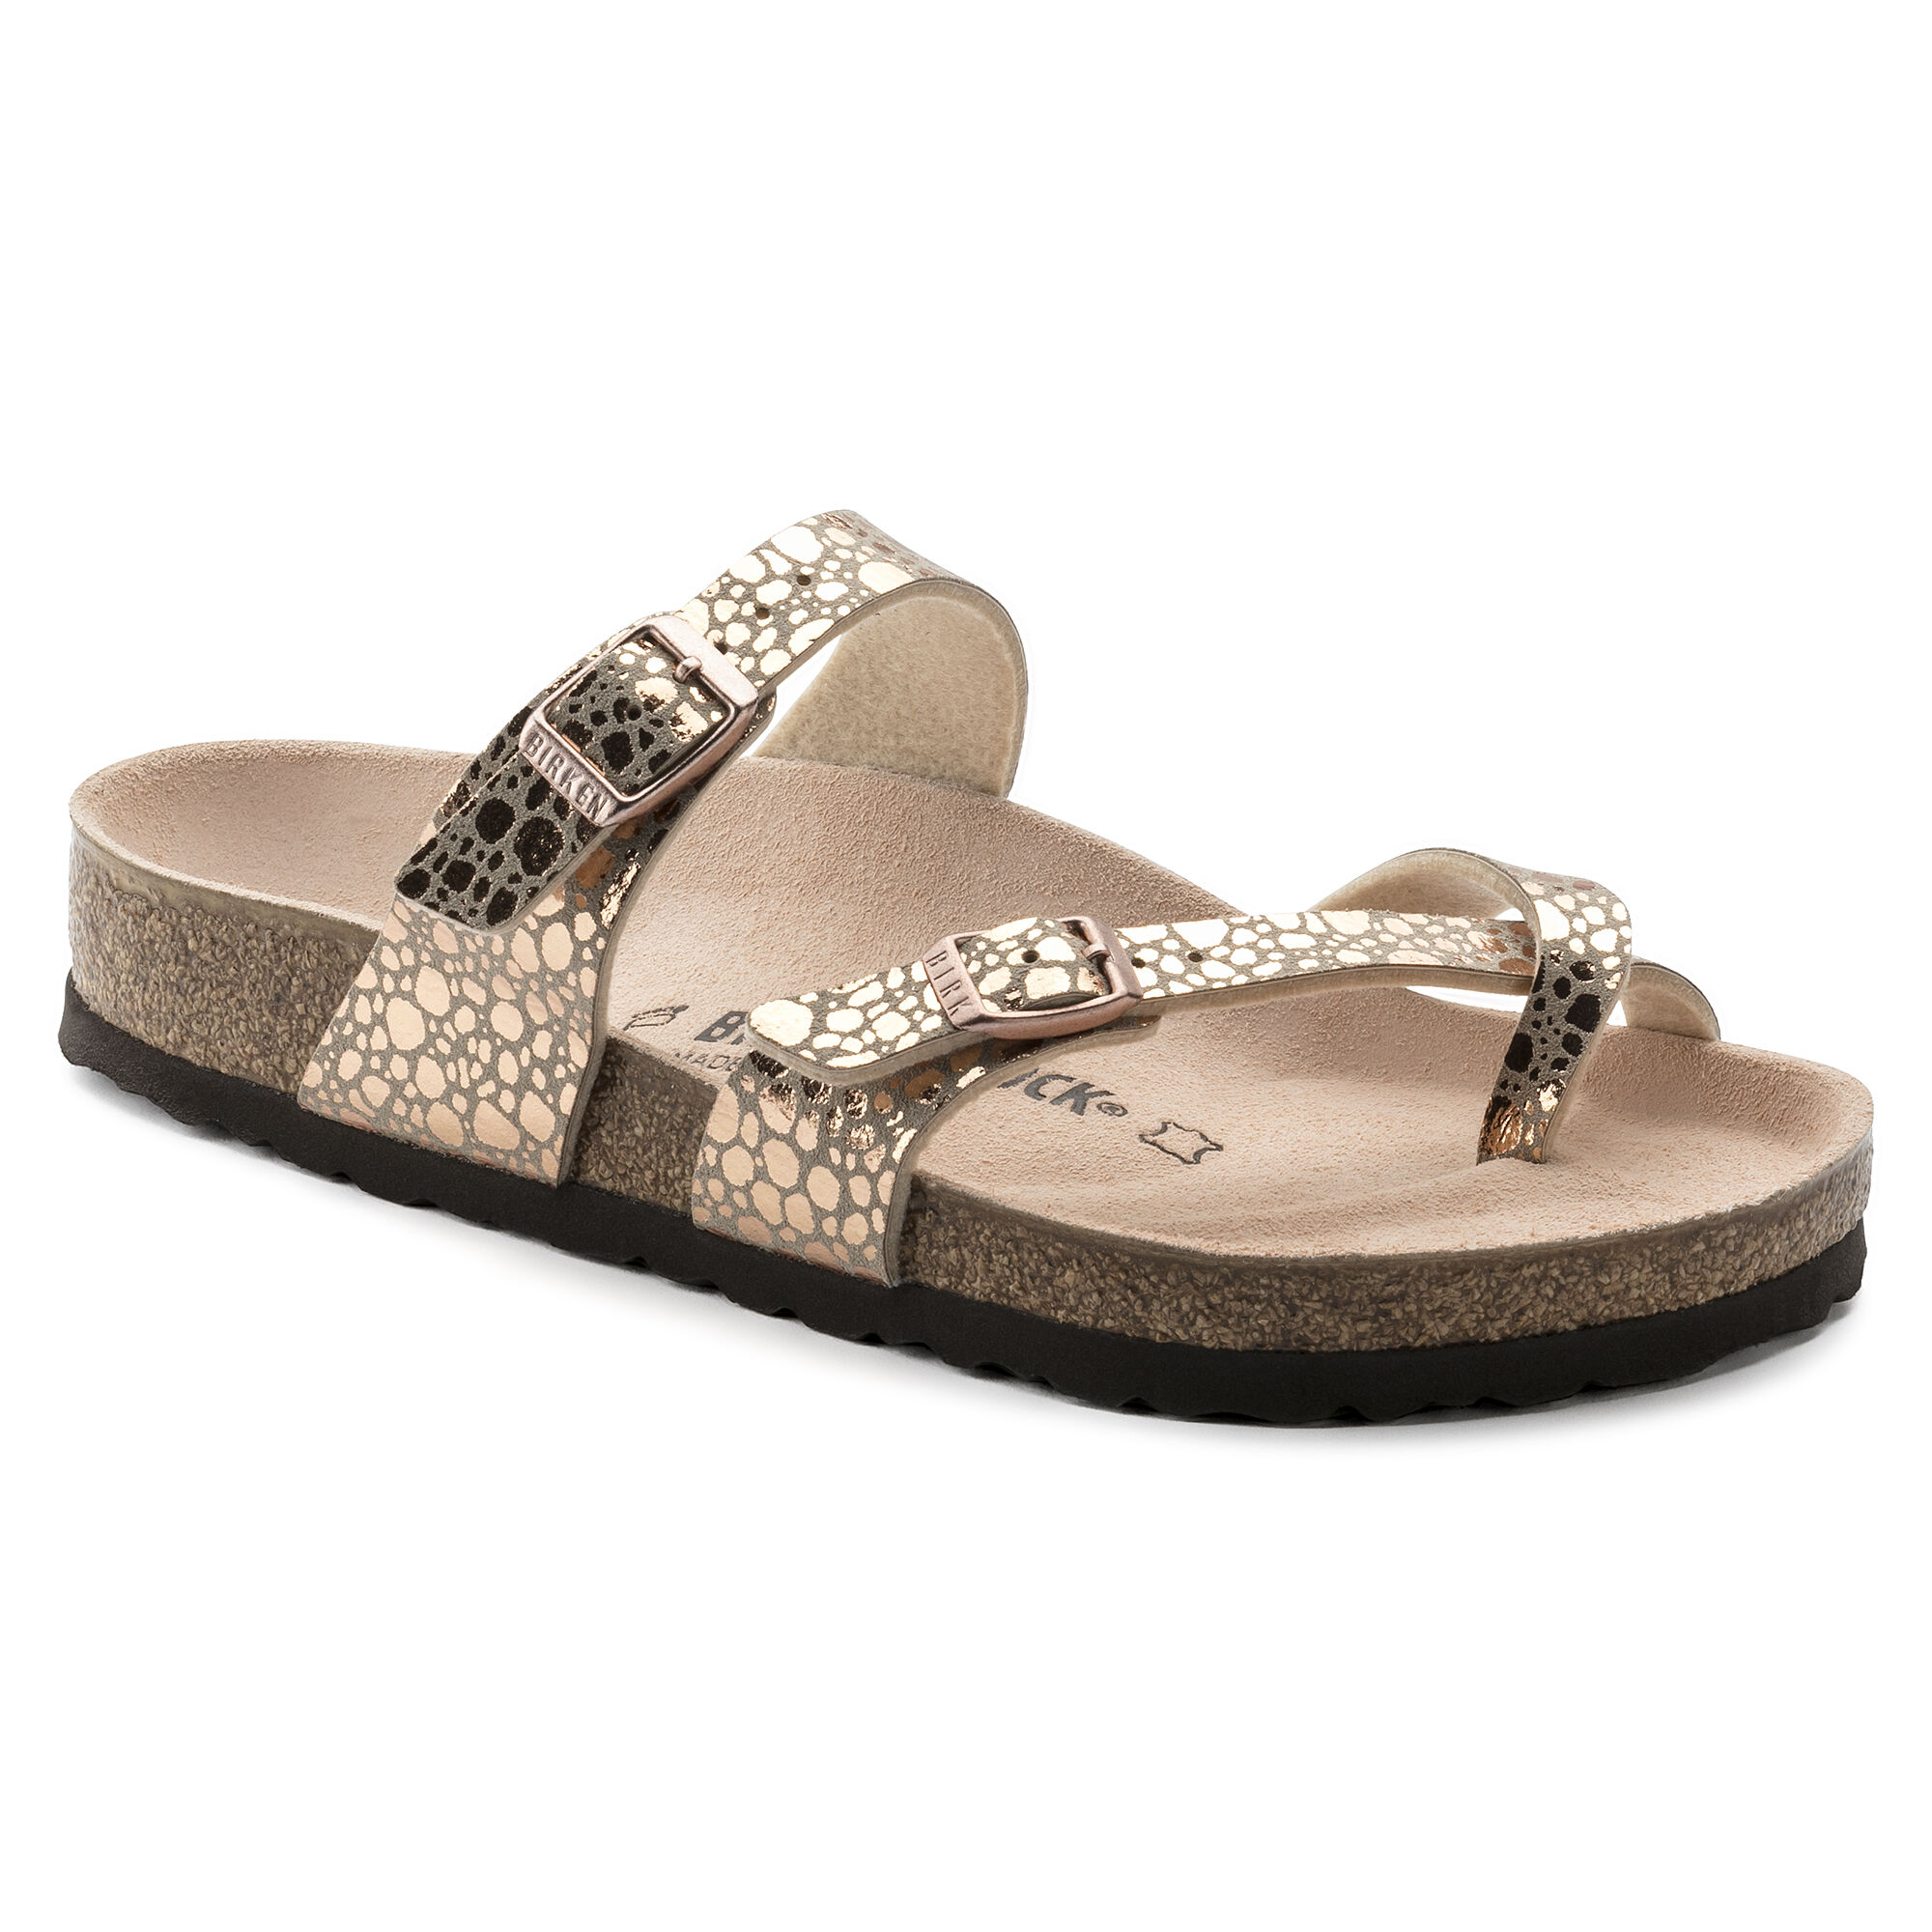 BIRKENSTOCK Womens Arizona Metallic Stones Silver Birko-Flor Sandals 38 EU H8xduBu